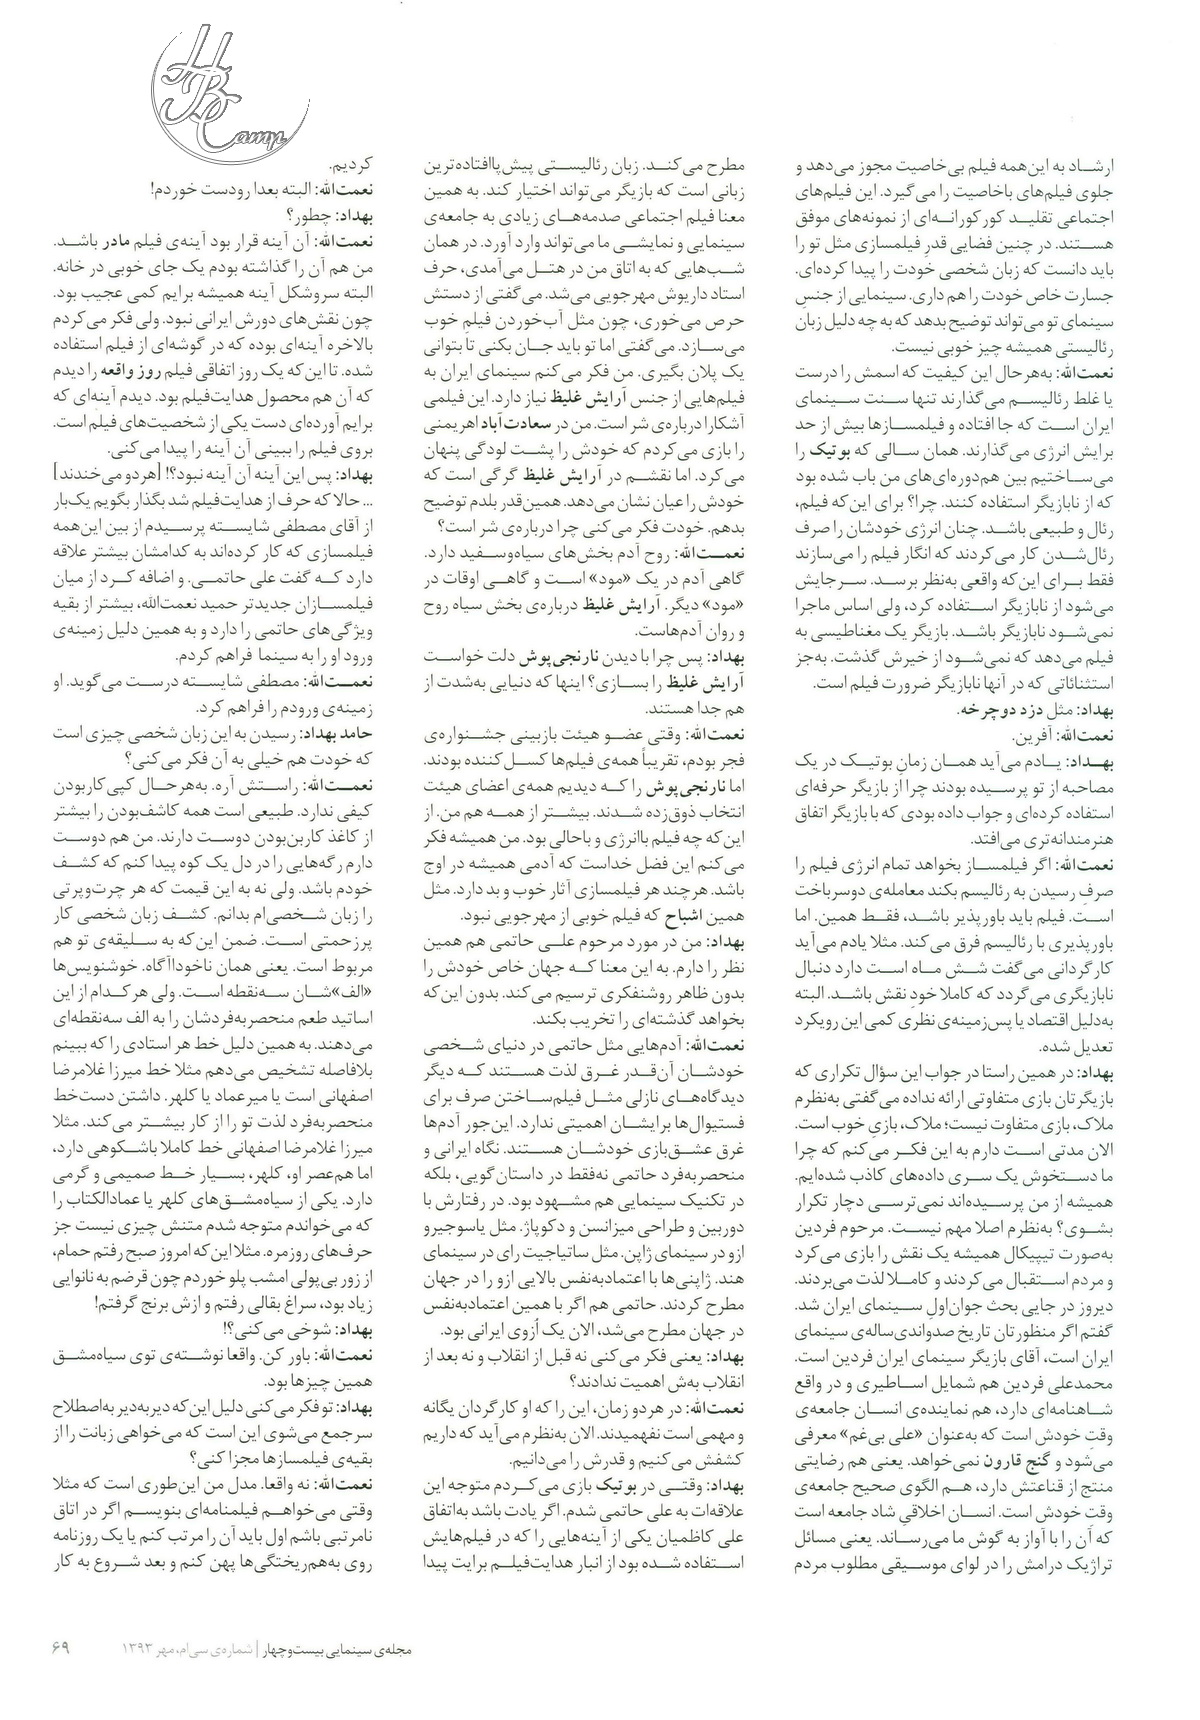 http://yotab.persiangig.com/magazin/24mag-56/06.jpg